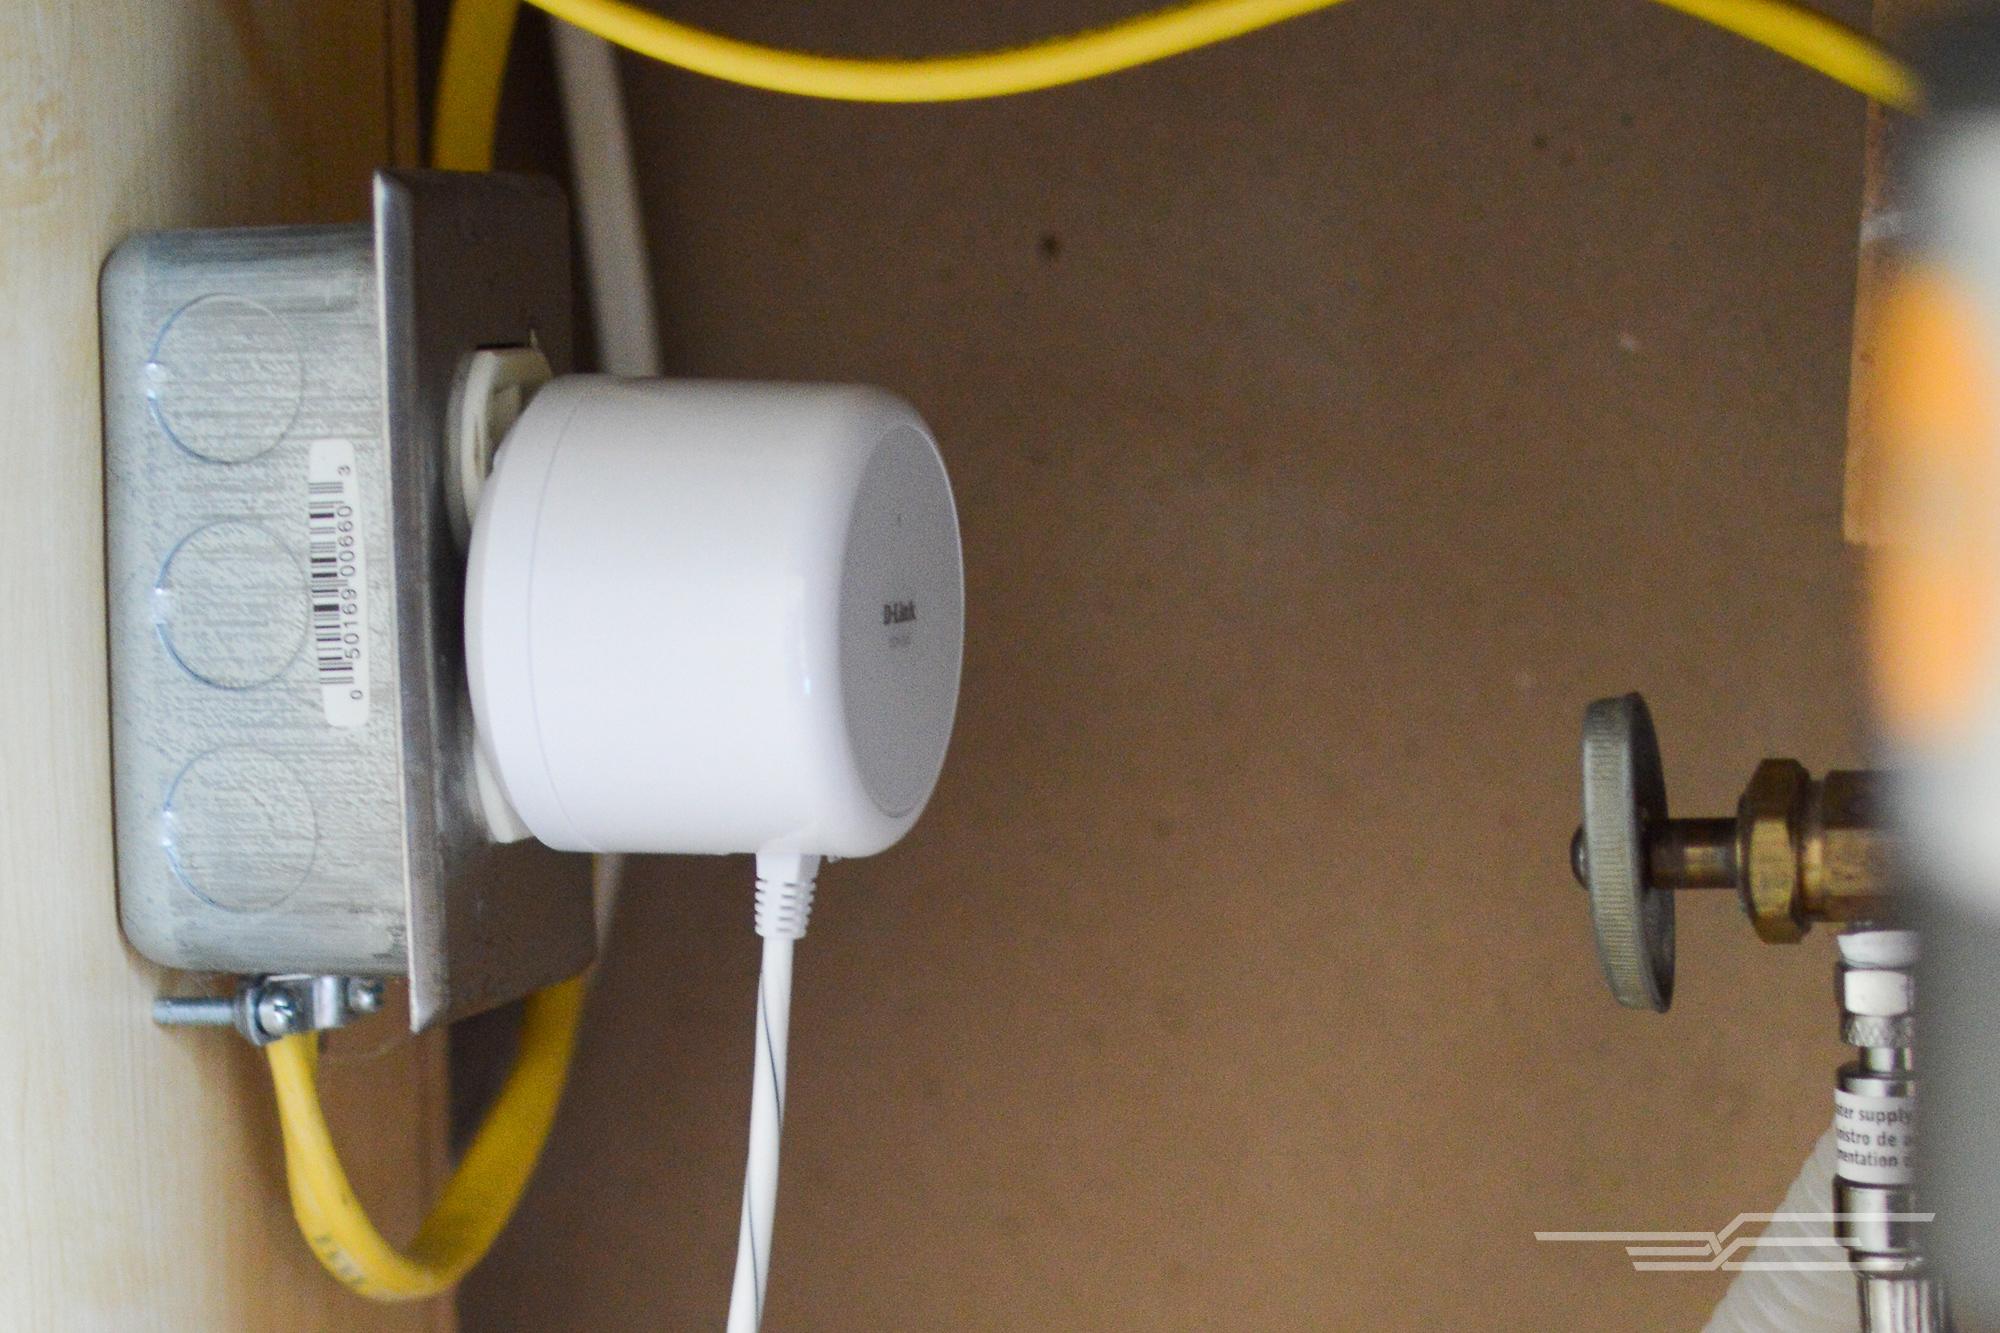 01-smart-leak-detector-2000.jpg